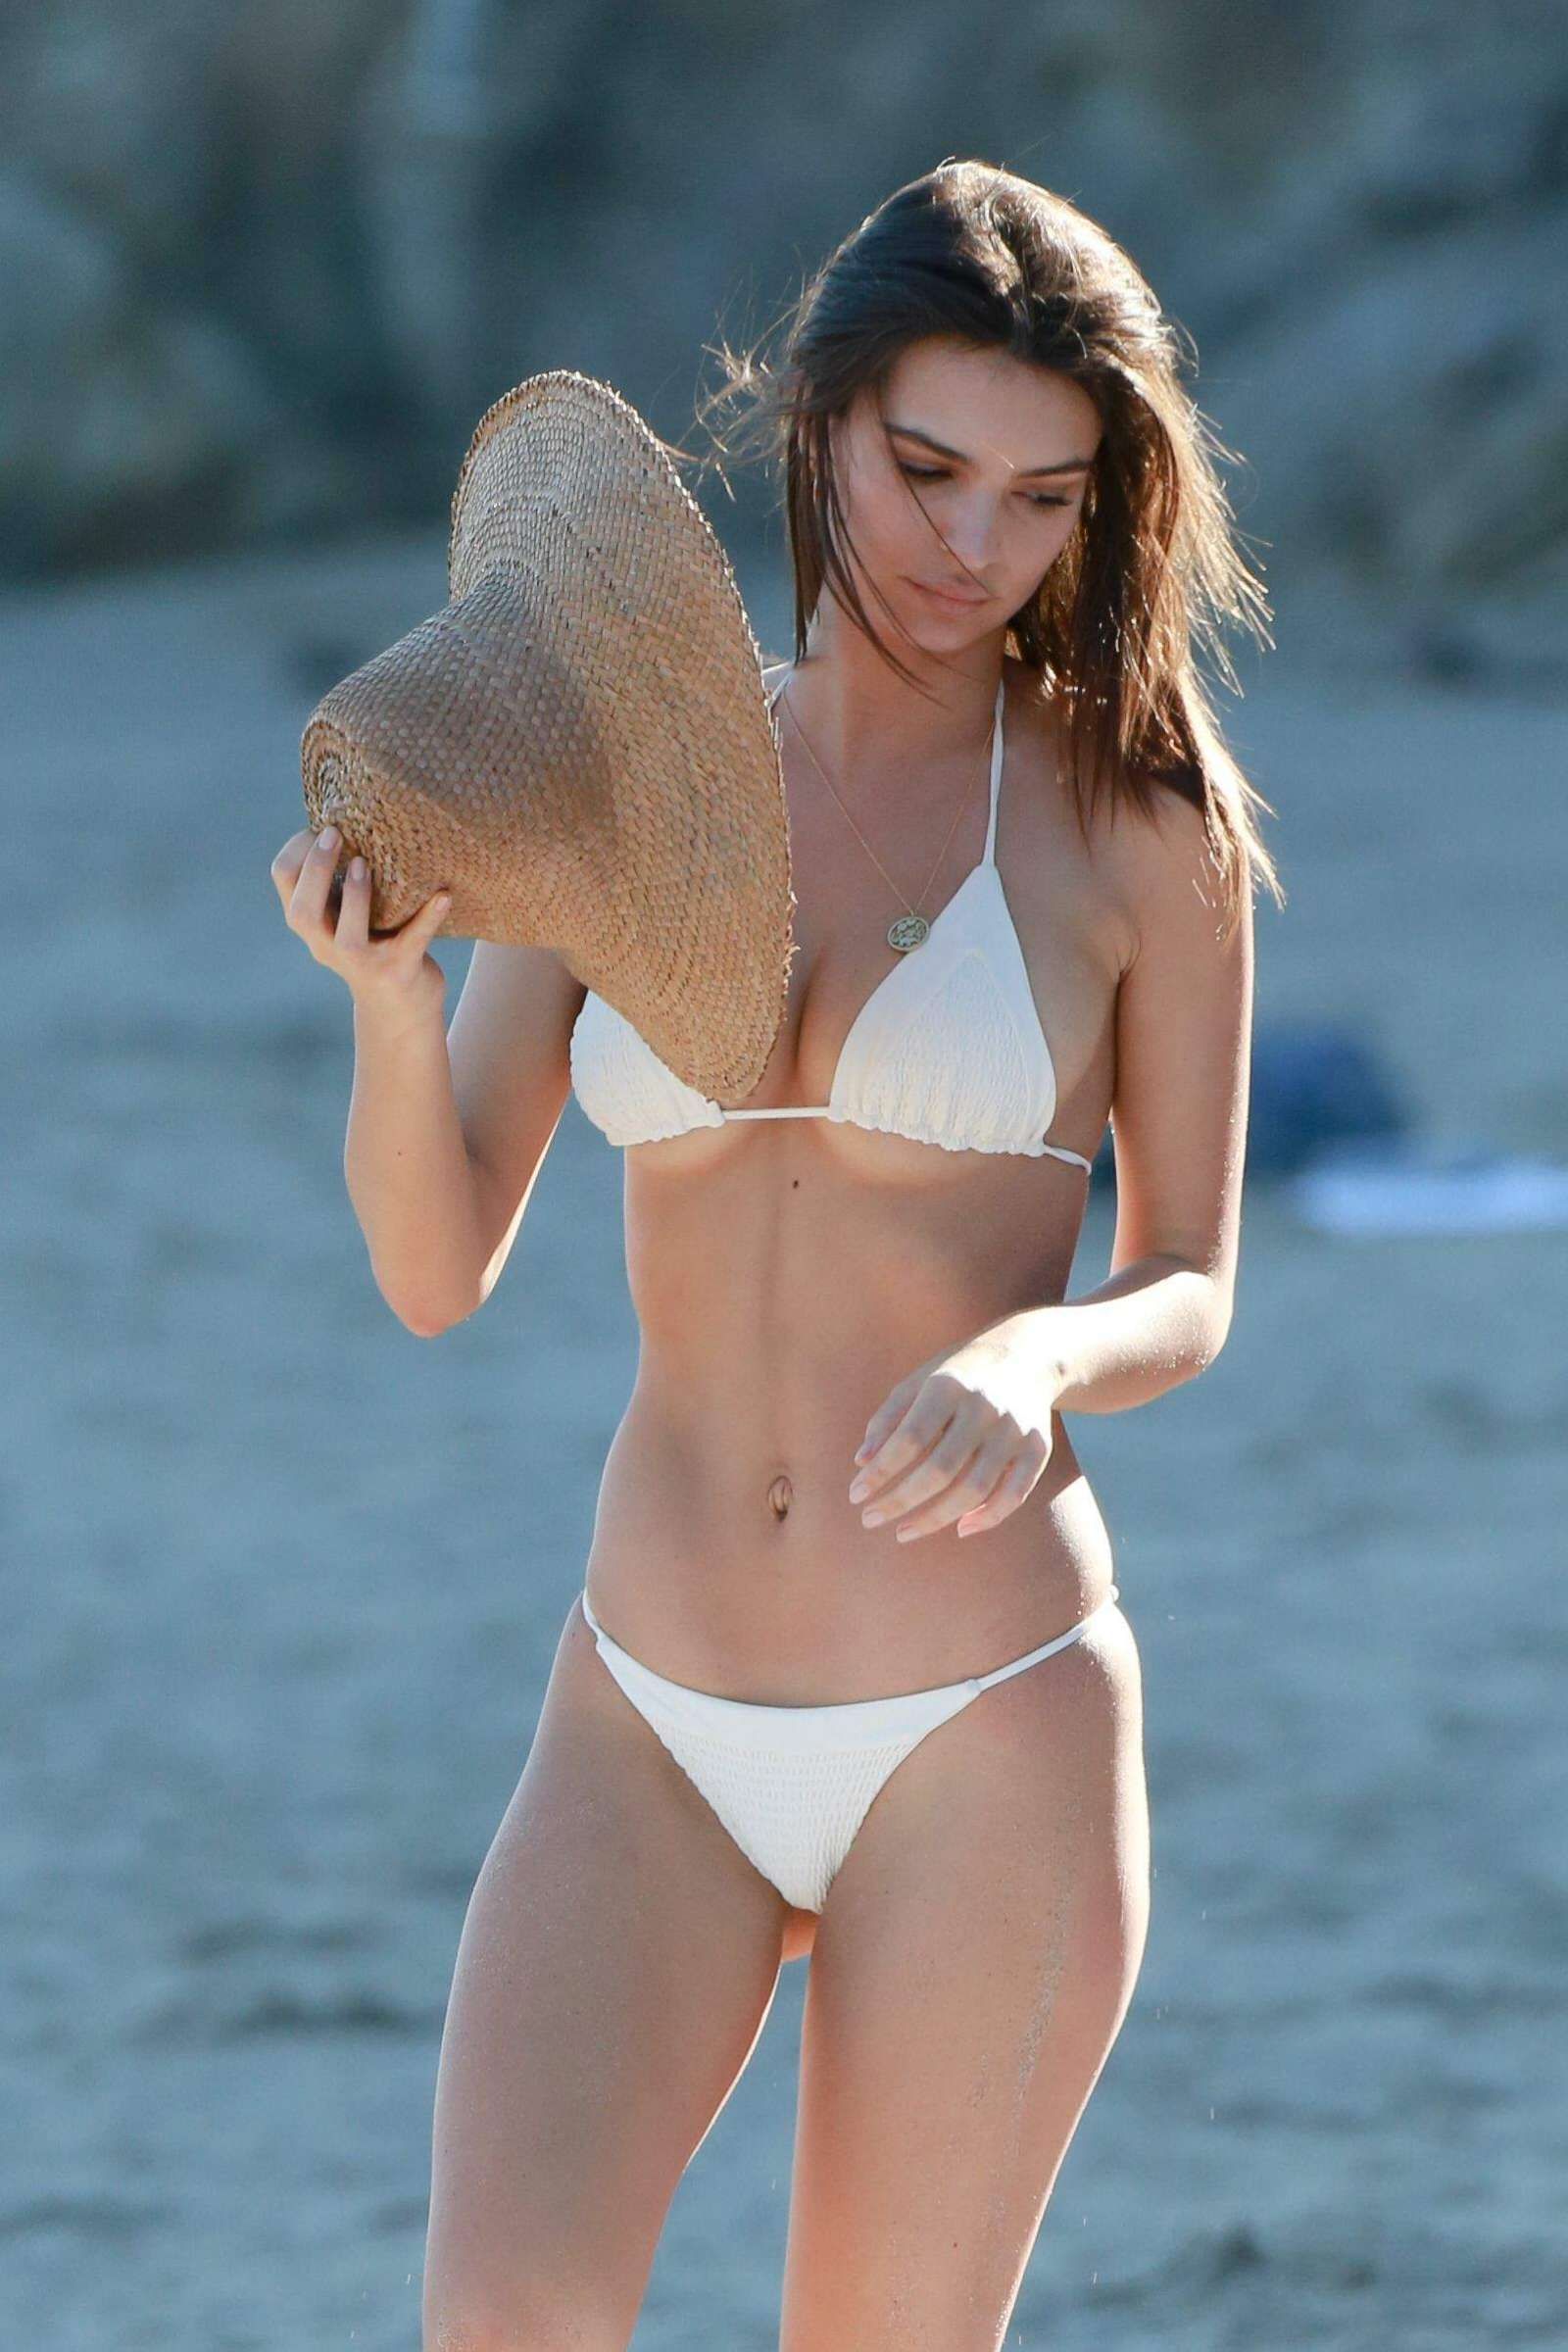 Emily-Ratajkowski-in-Bikini-2017--10.jpg